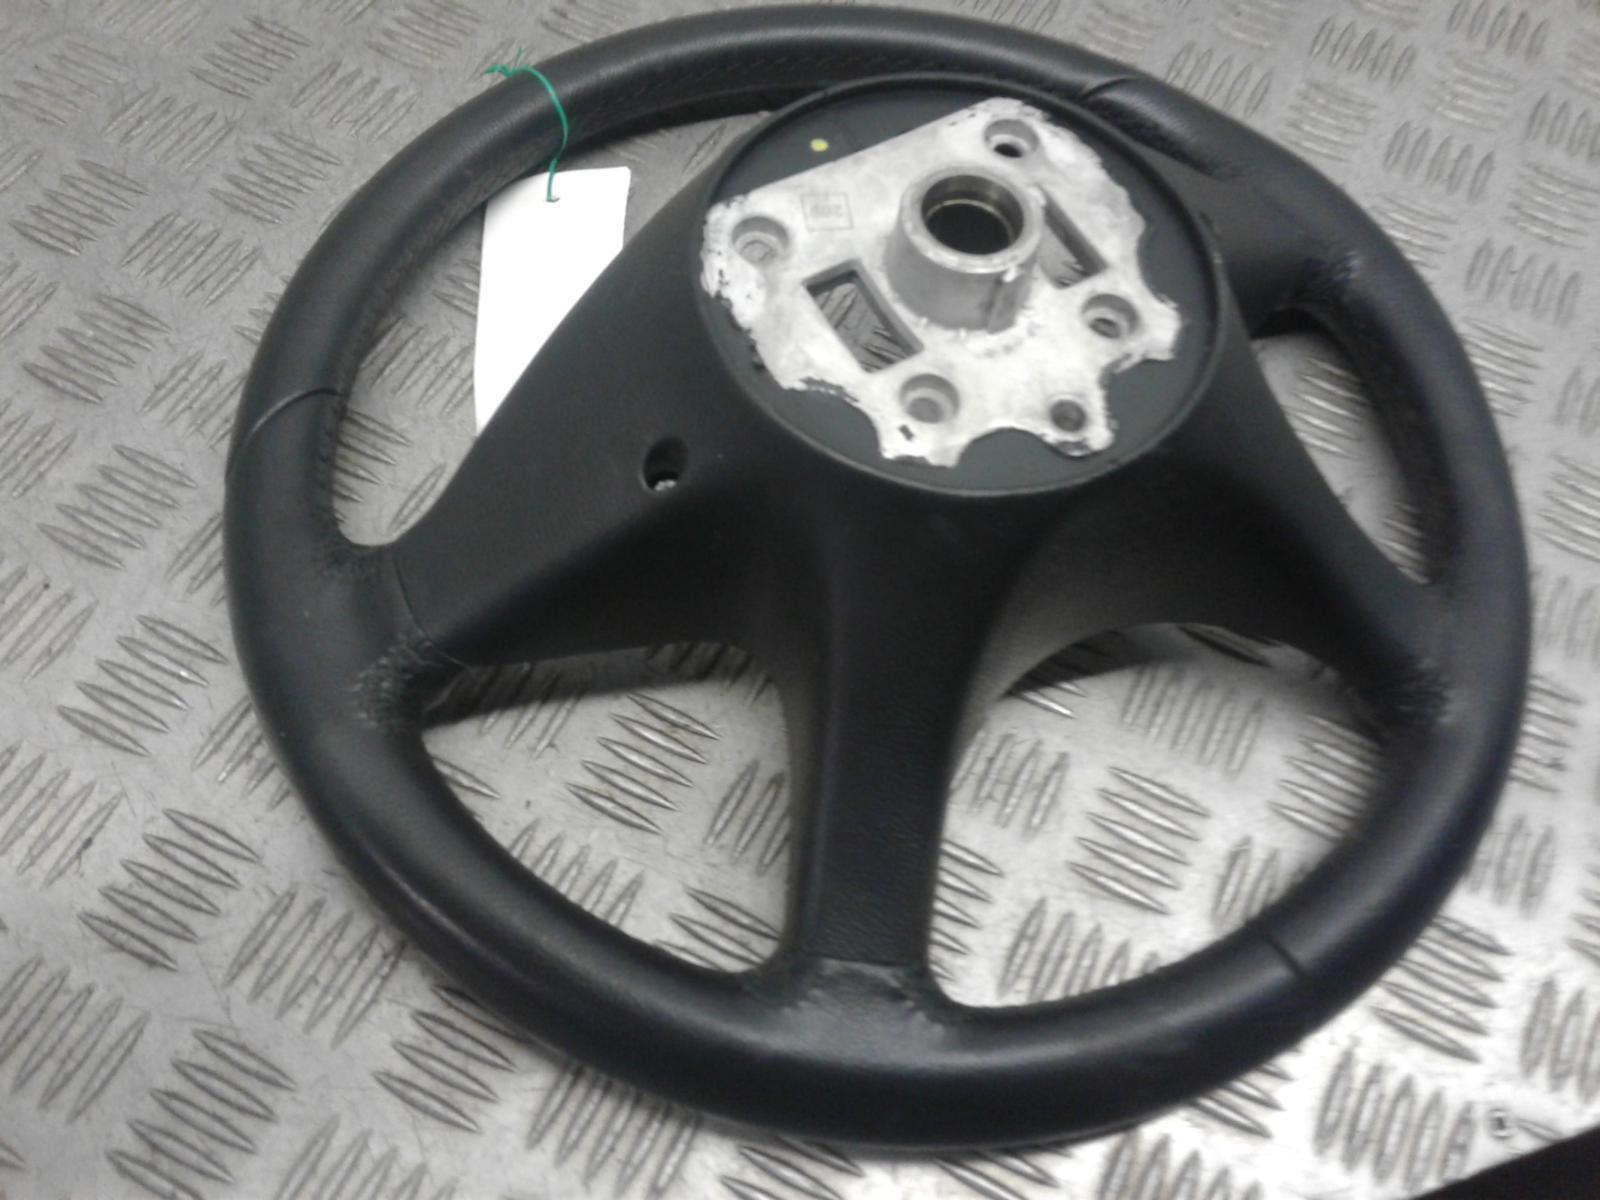 View Auto part Steering Wheel Mercedes C Class 2010